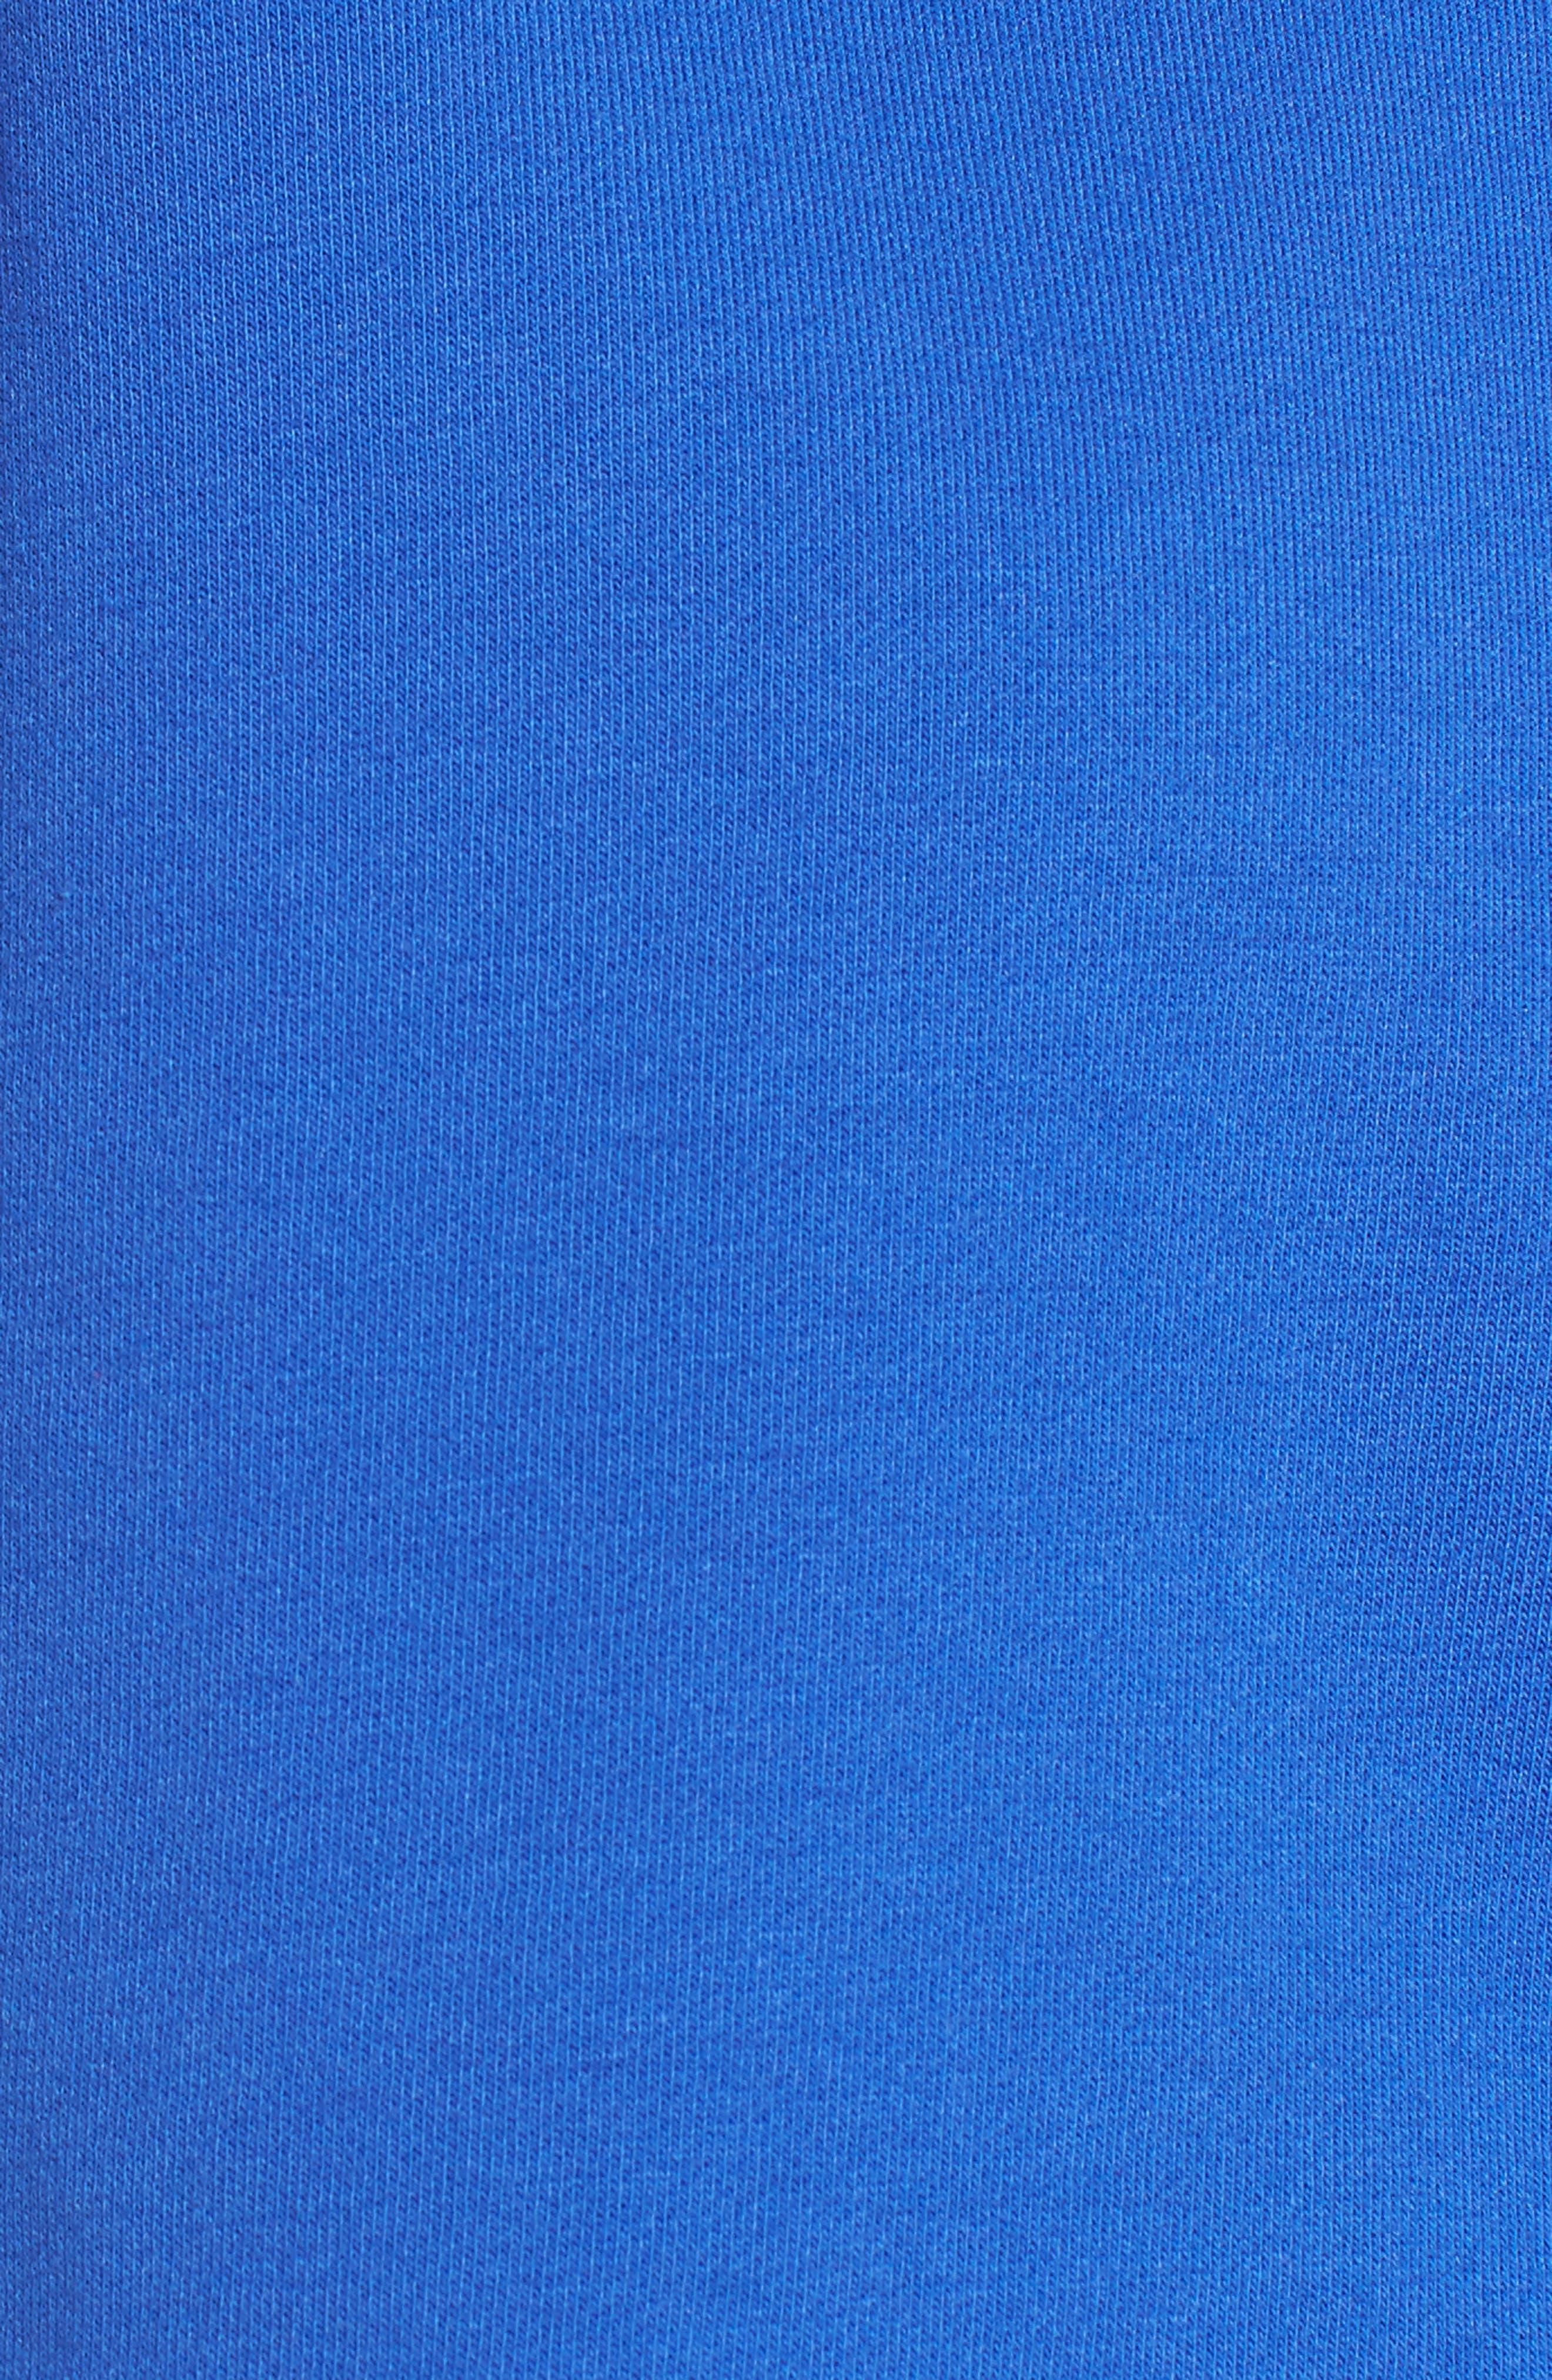 FENTY PUMA by Rihanna Hooded Crop Sweatshirt,                             Alternate thumbnail 6, color,                             Dazzling Blue